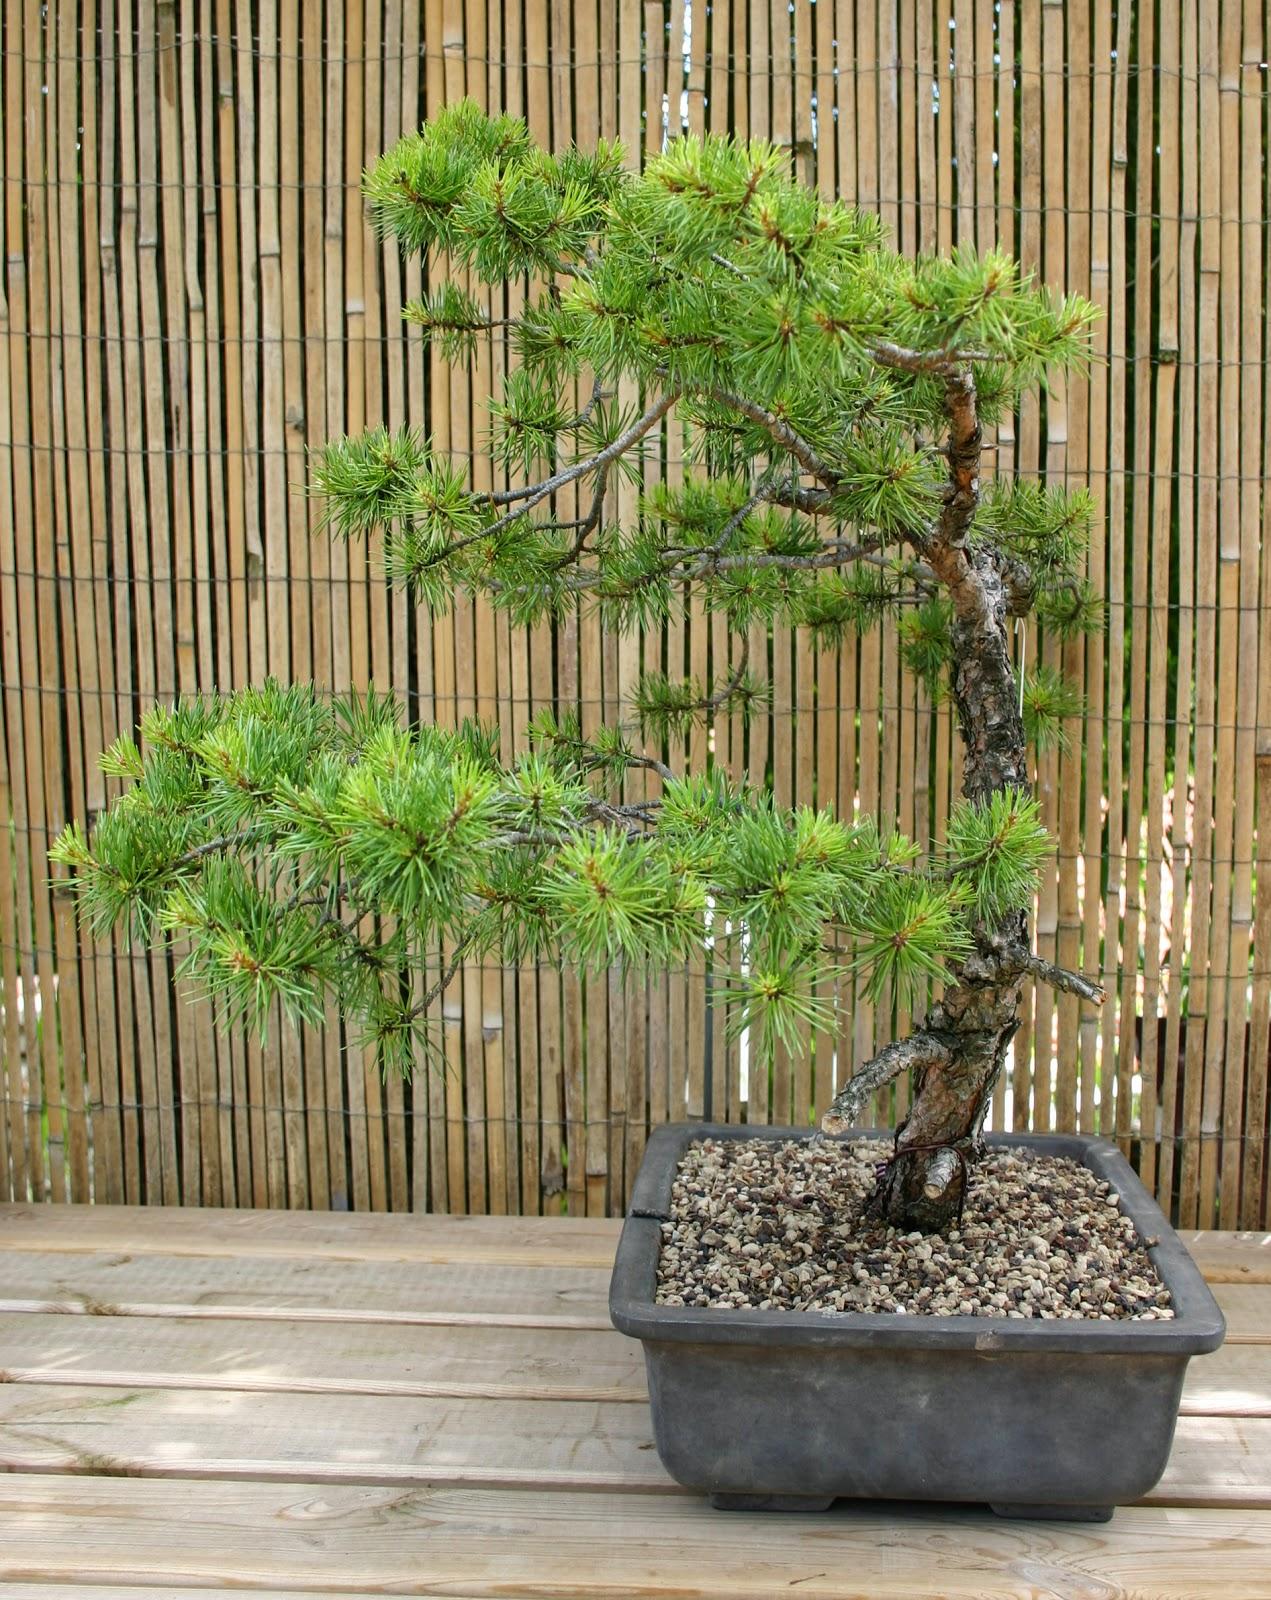 profession bonsa pins sylvestres bruts ou travaill s vendre l 39 arbre aux papillons. Black Bedroom Furniture Sets. Home Design Ideas